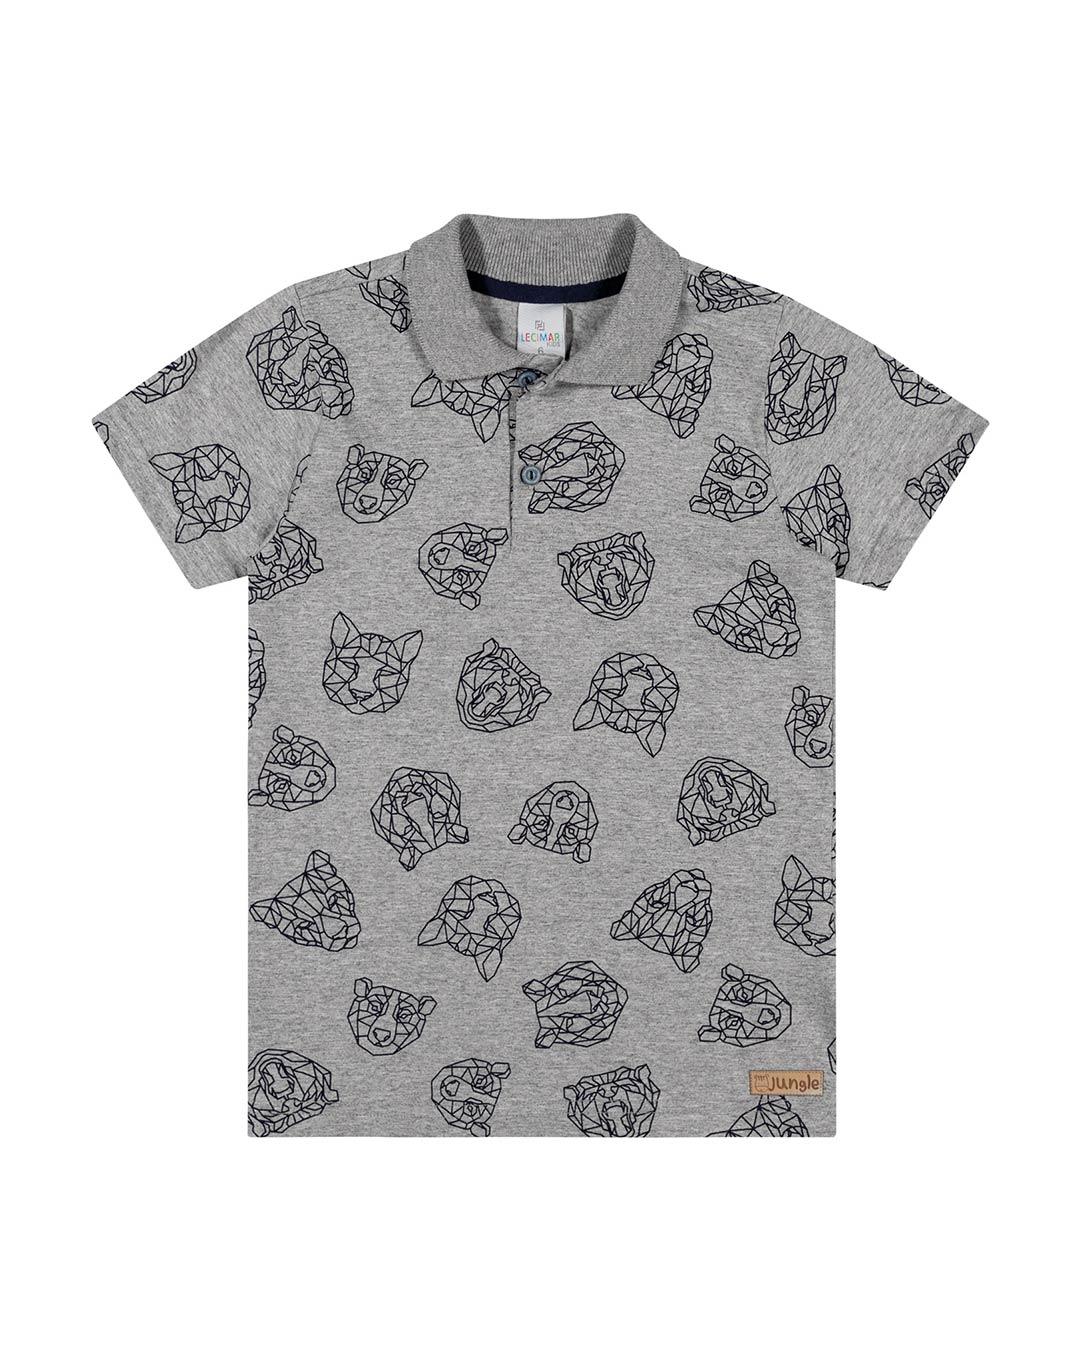 Camisa Polo Infantil Tigre Cinza - Lecimar